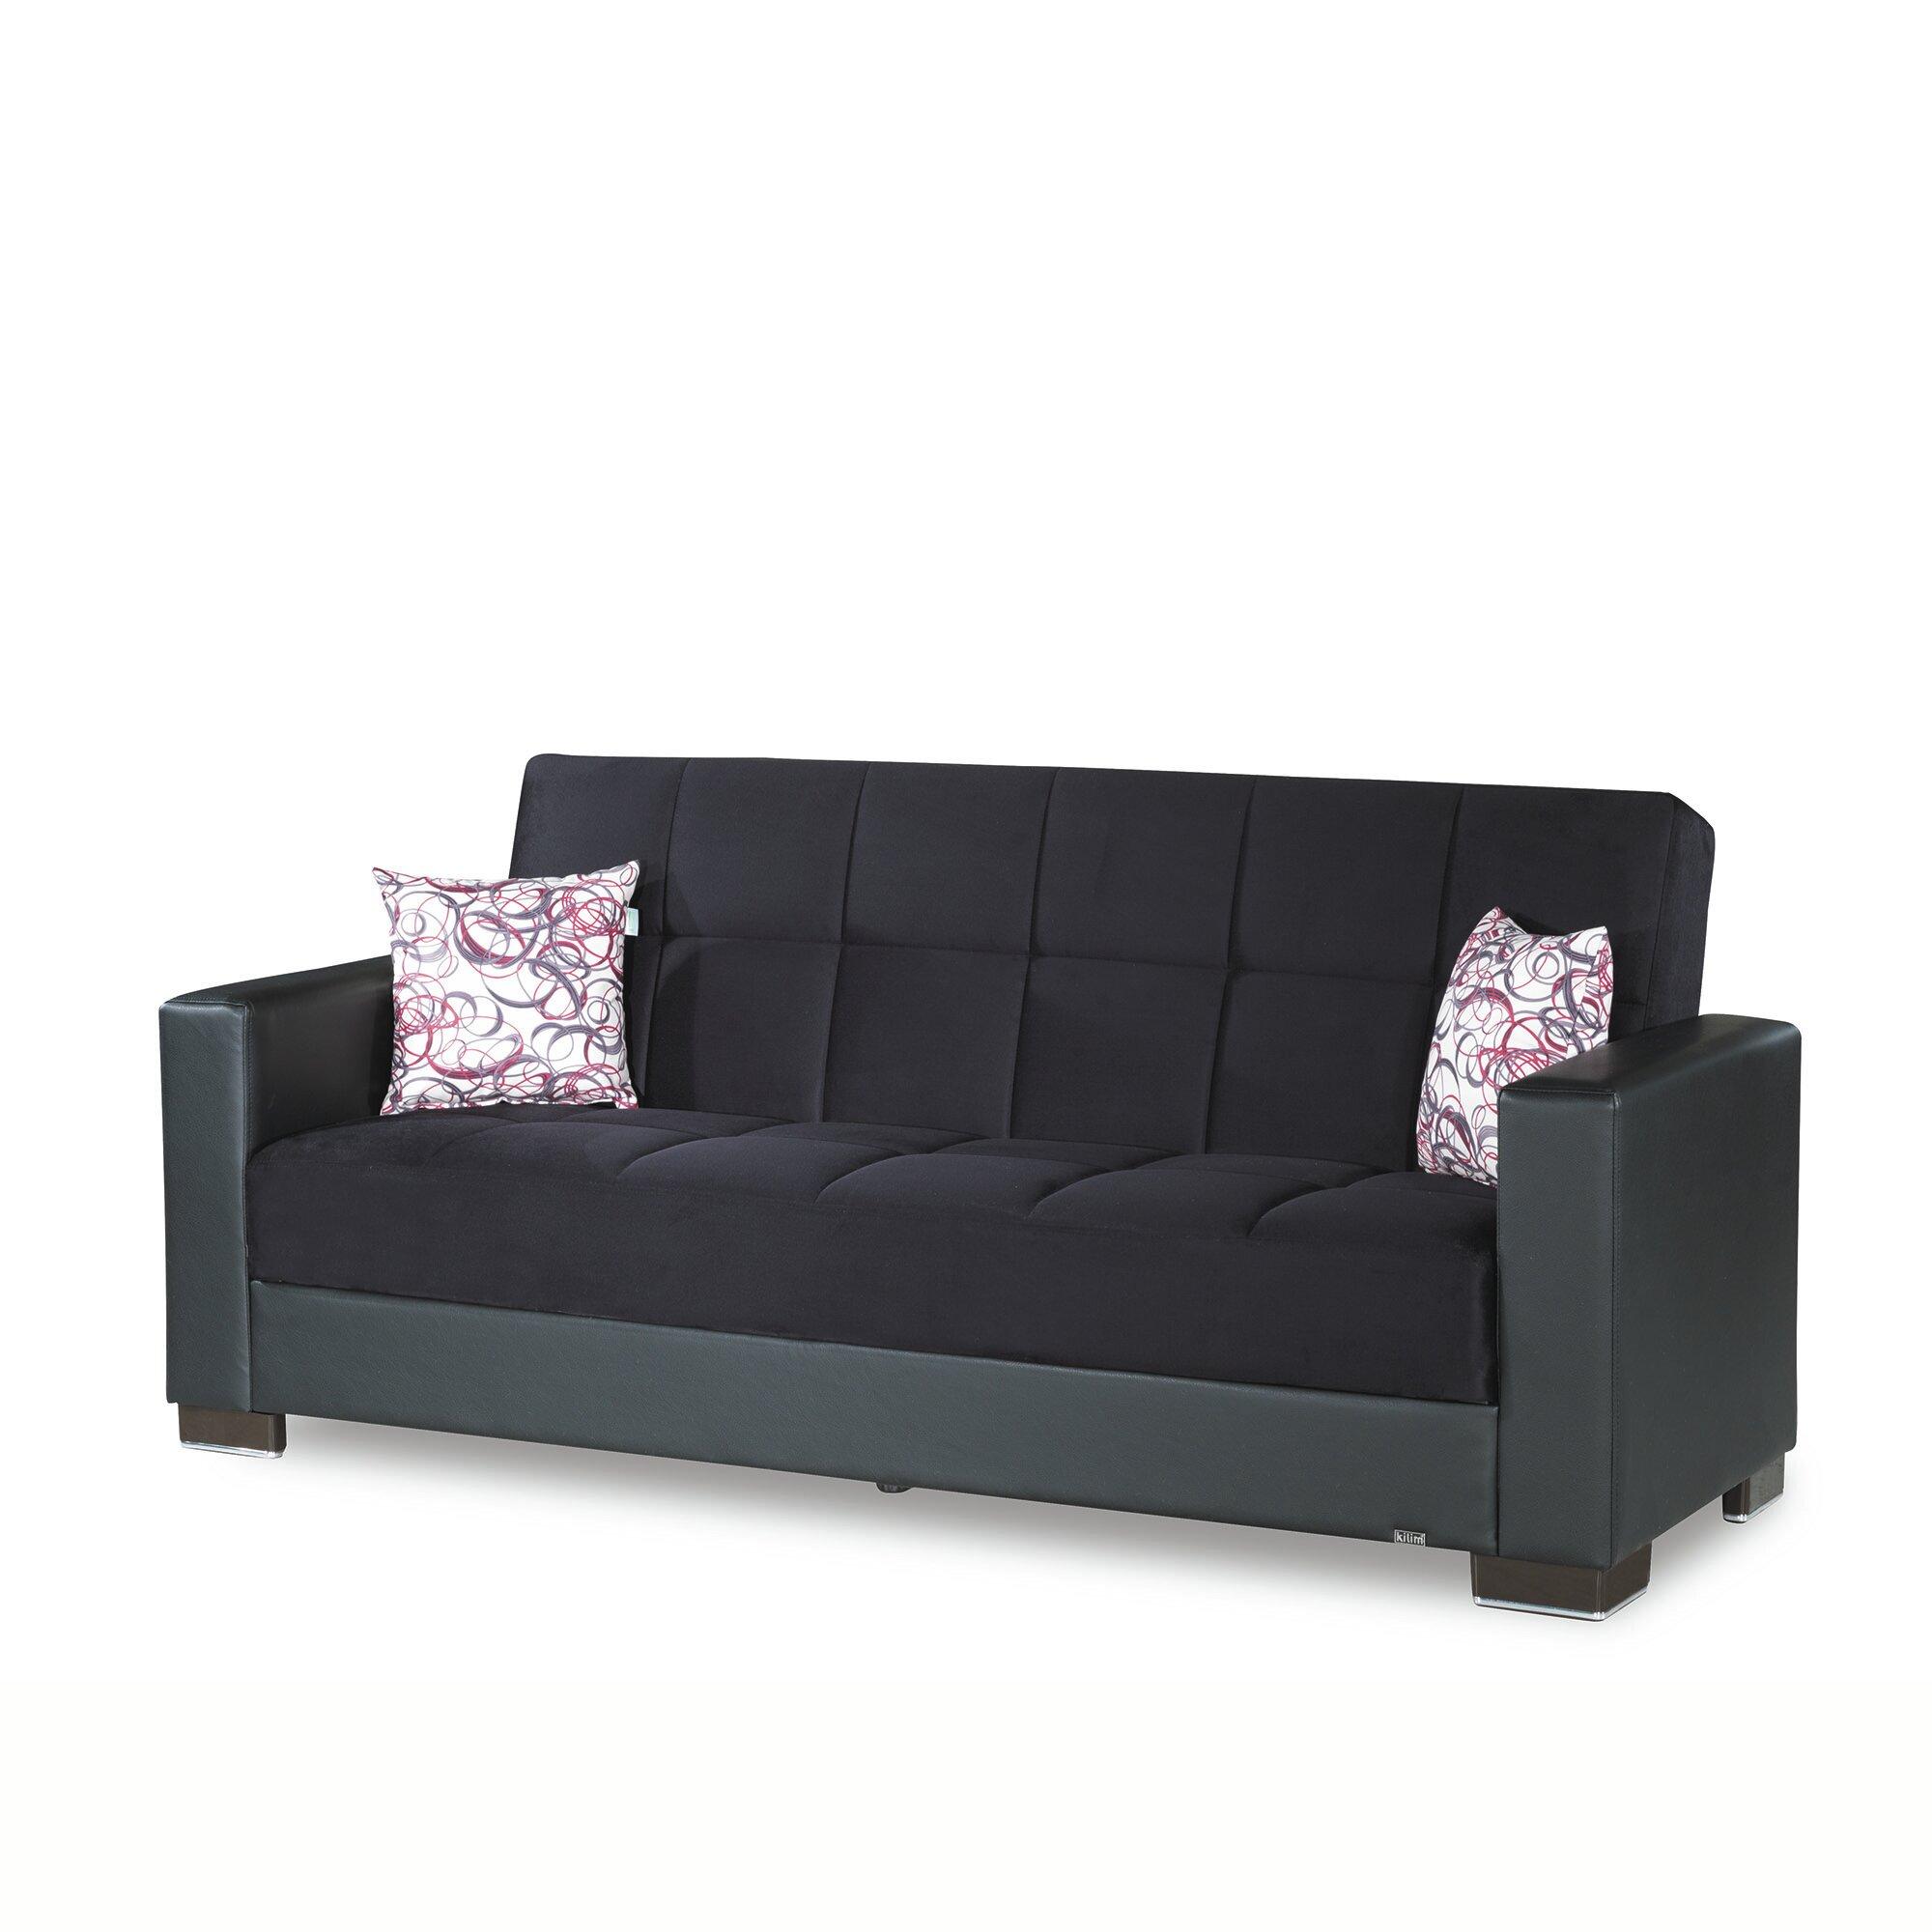 Superb Wrought Studio Sharla Sofa Reviews Wayfair Ibusinesslaw Wood Chair Design Ideas Ibusinesslaworg